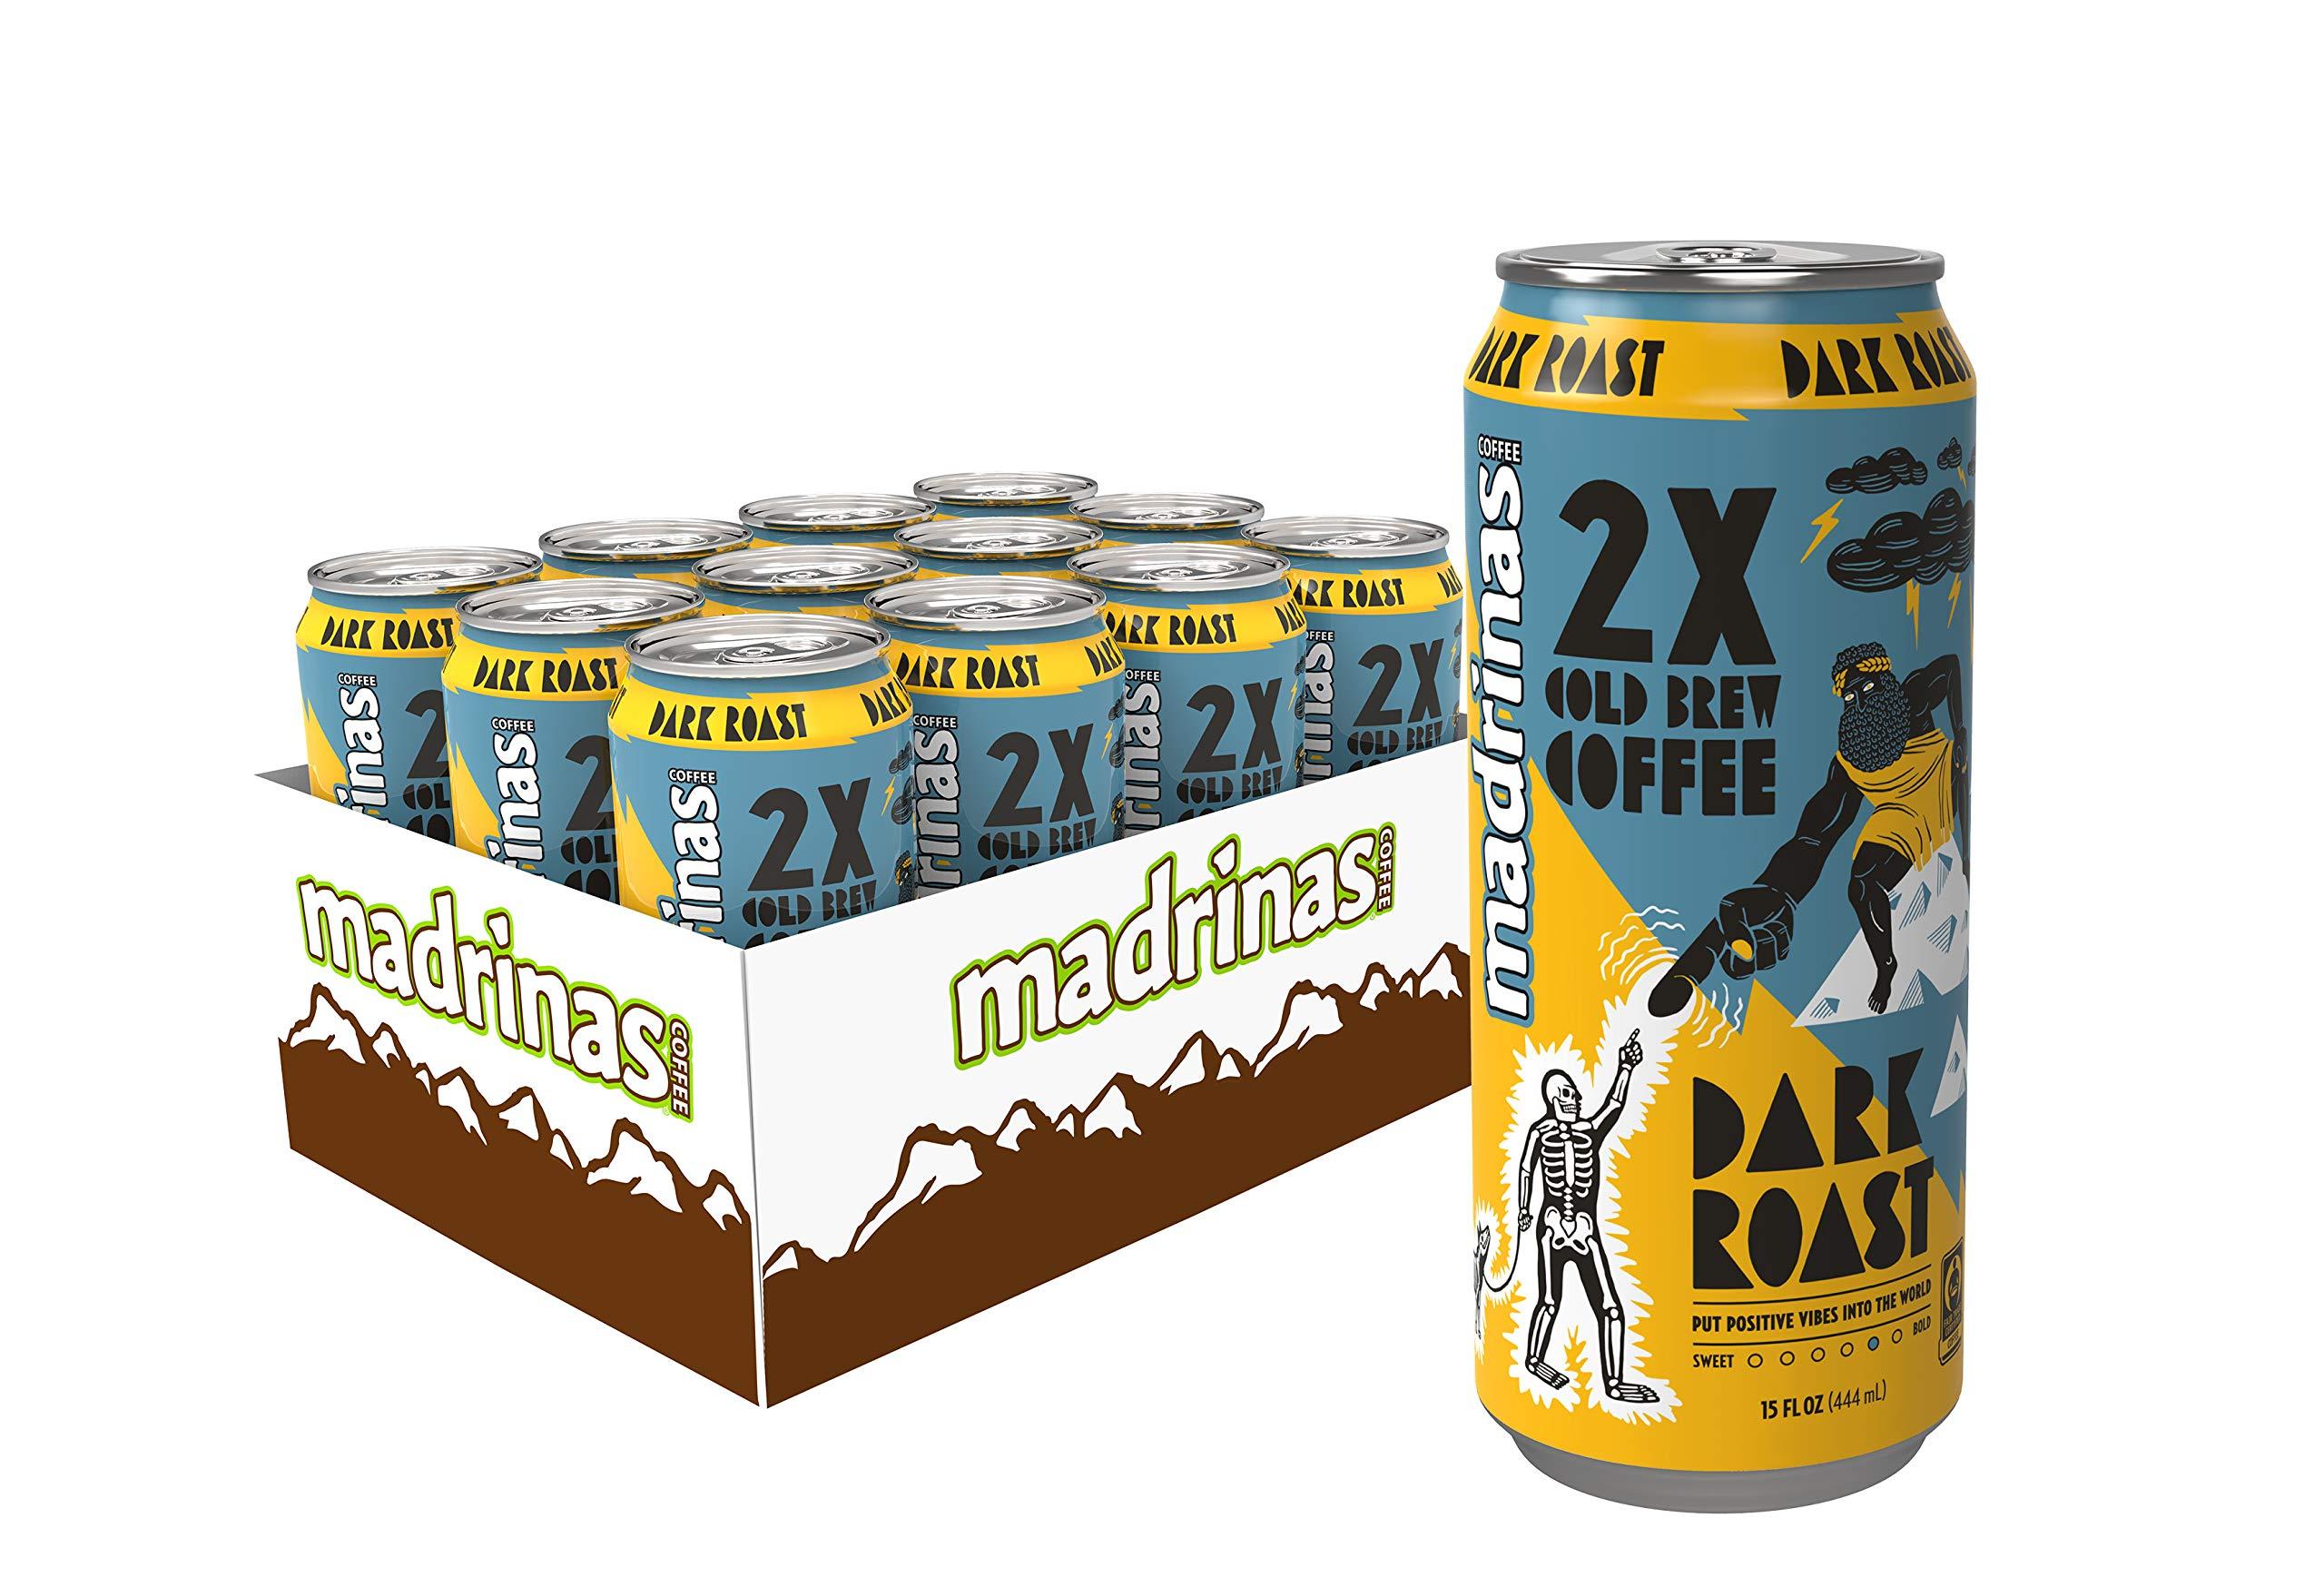 Madrinas Coffee 2X Dark Roast Fair Trade Cold Brew, 15 fl oz (Pack of 12) by Madrinas Coffee